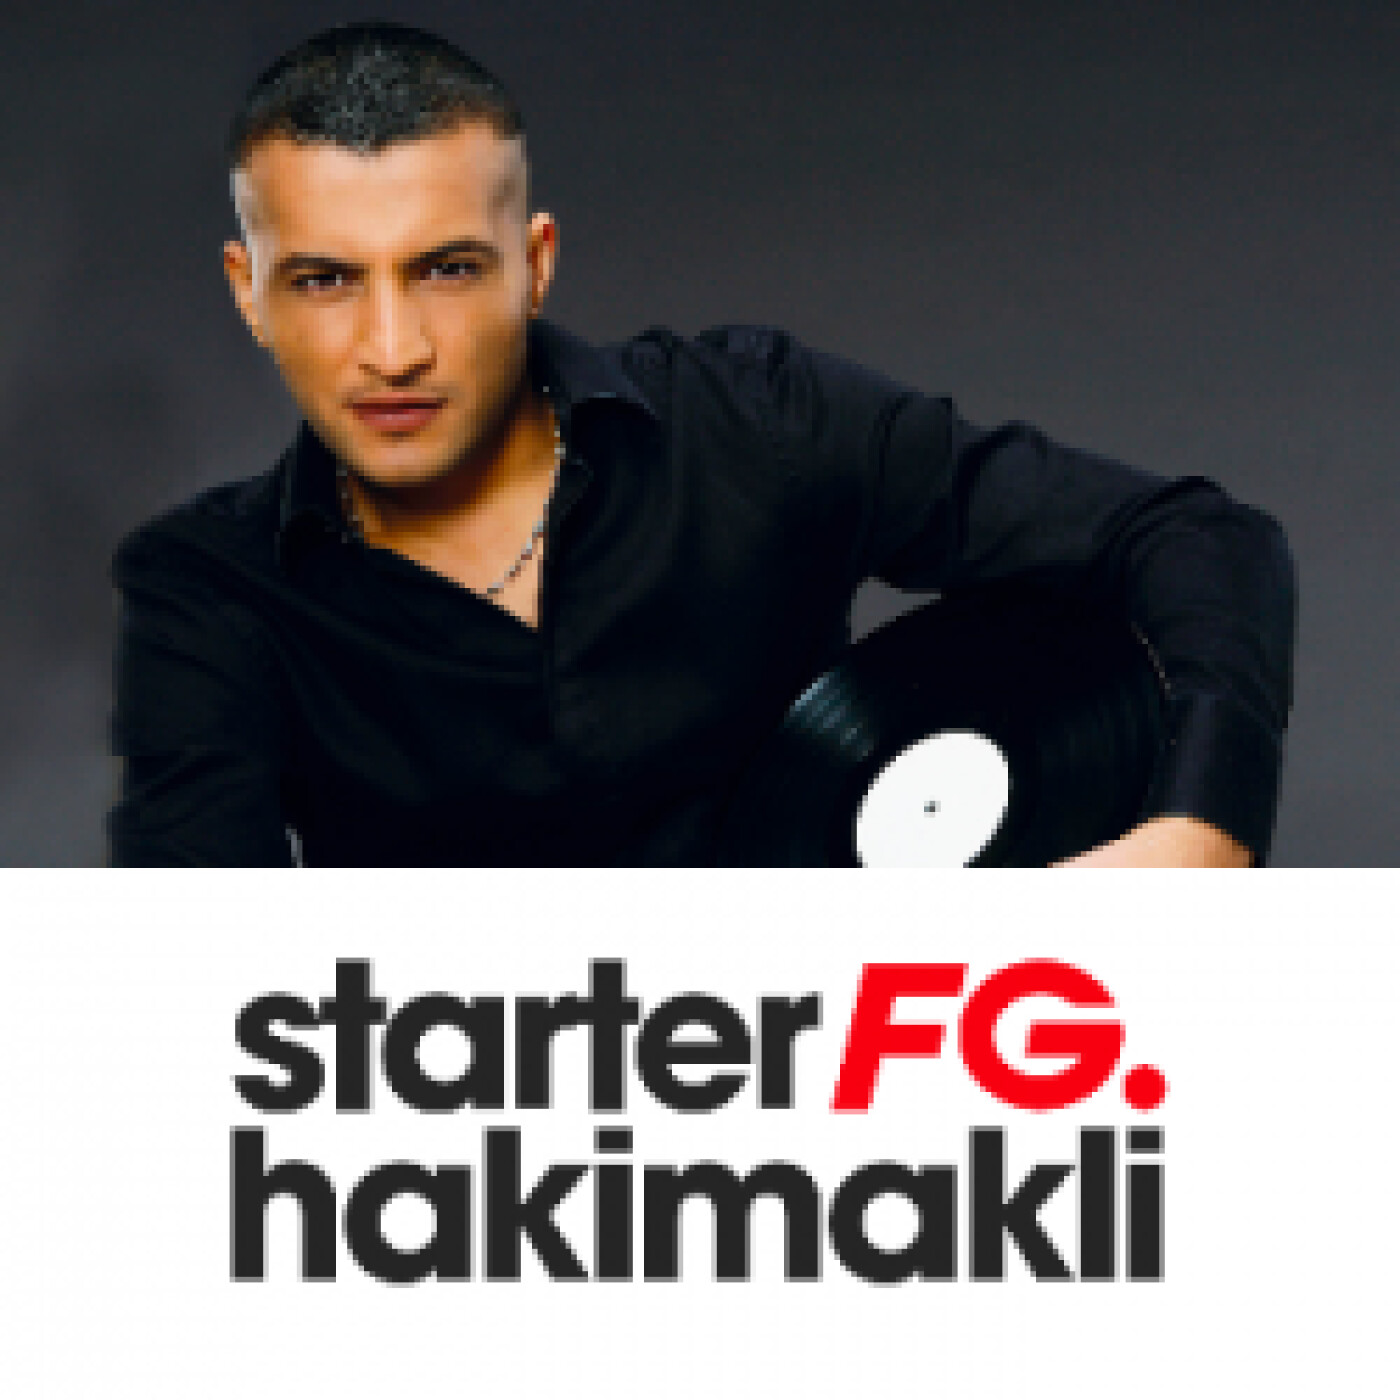 STARTER FG BY HAKIMAKLI MARDI 27 AVRIL 2021